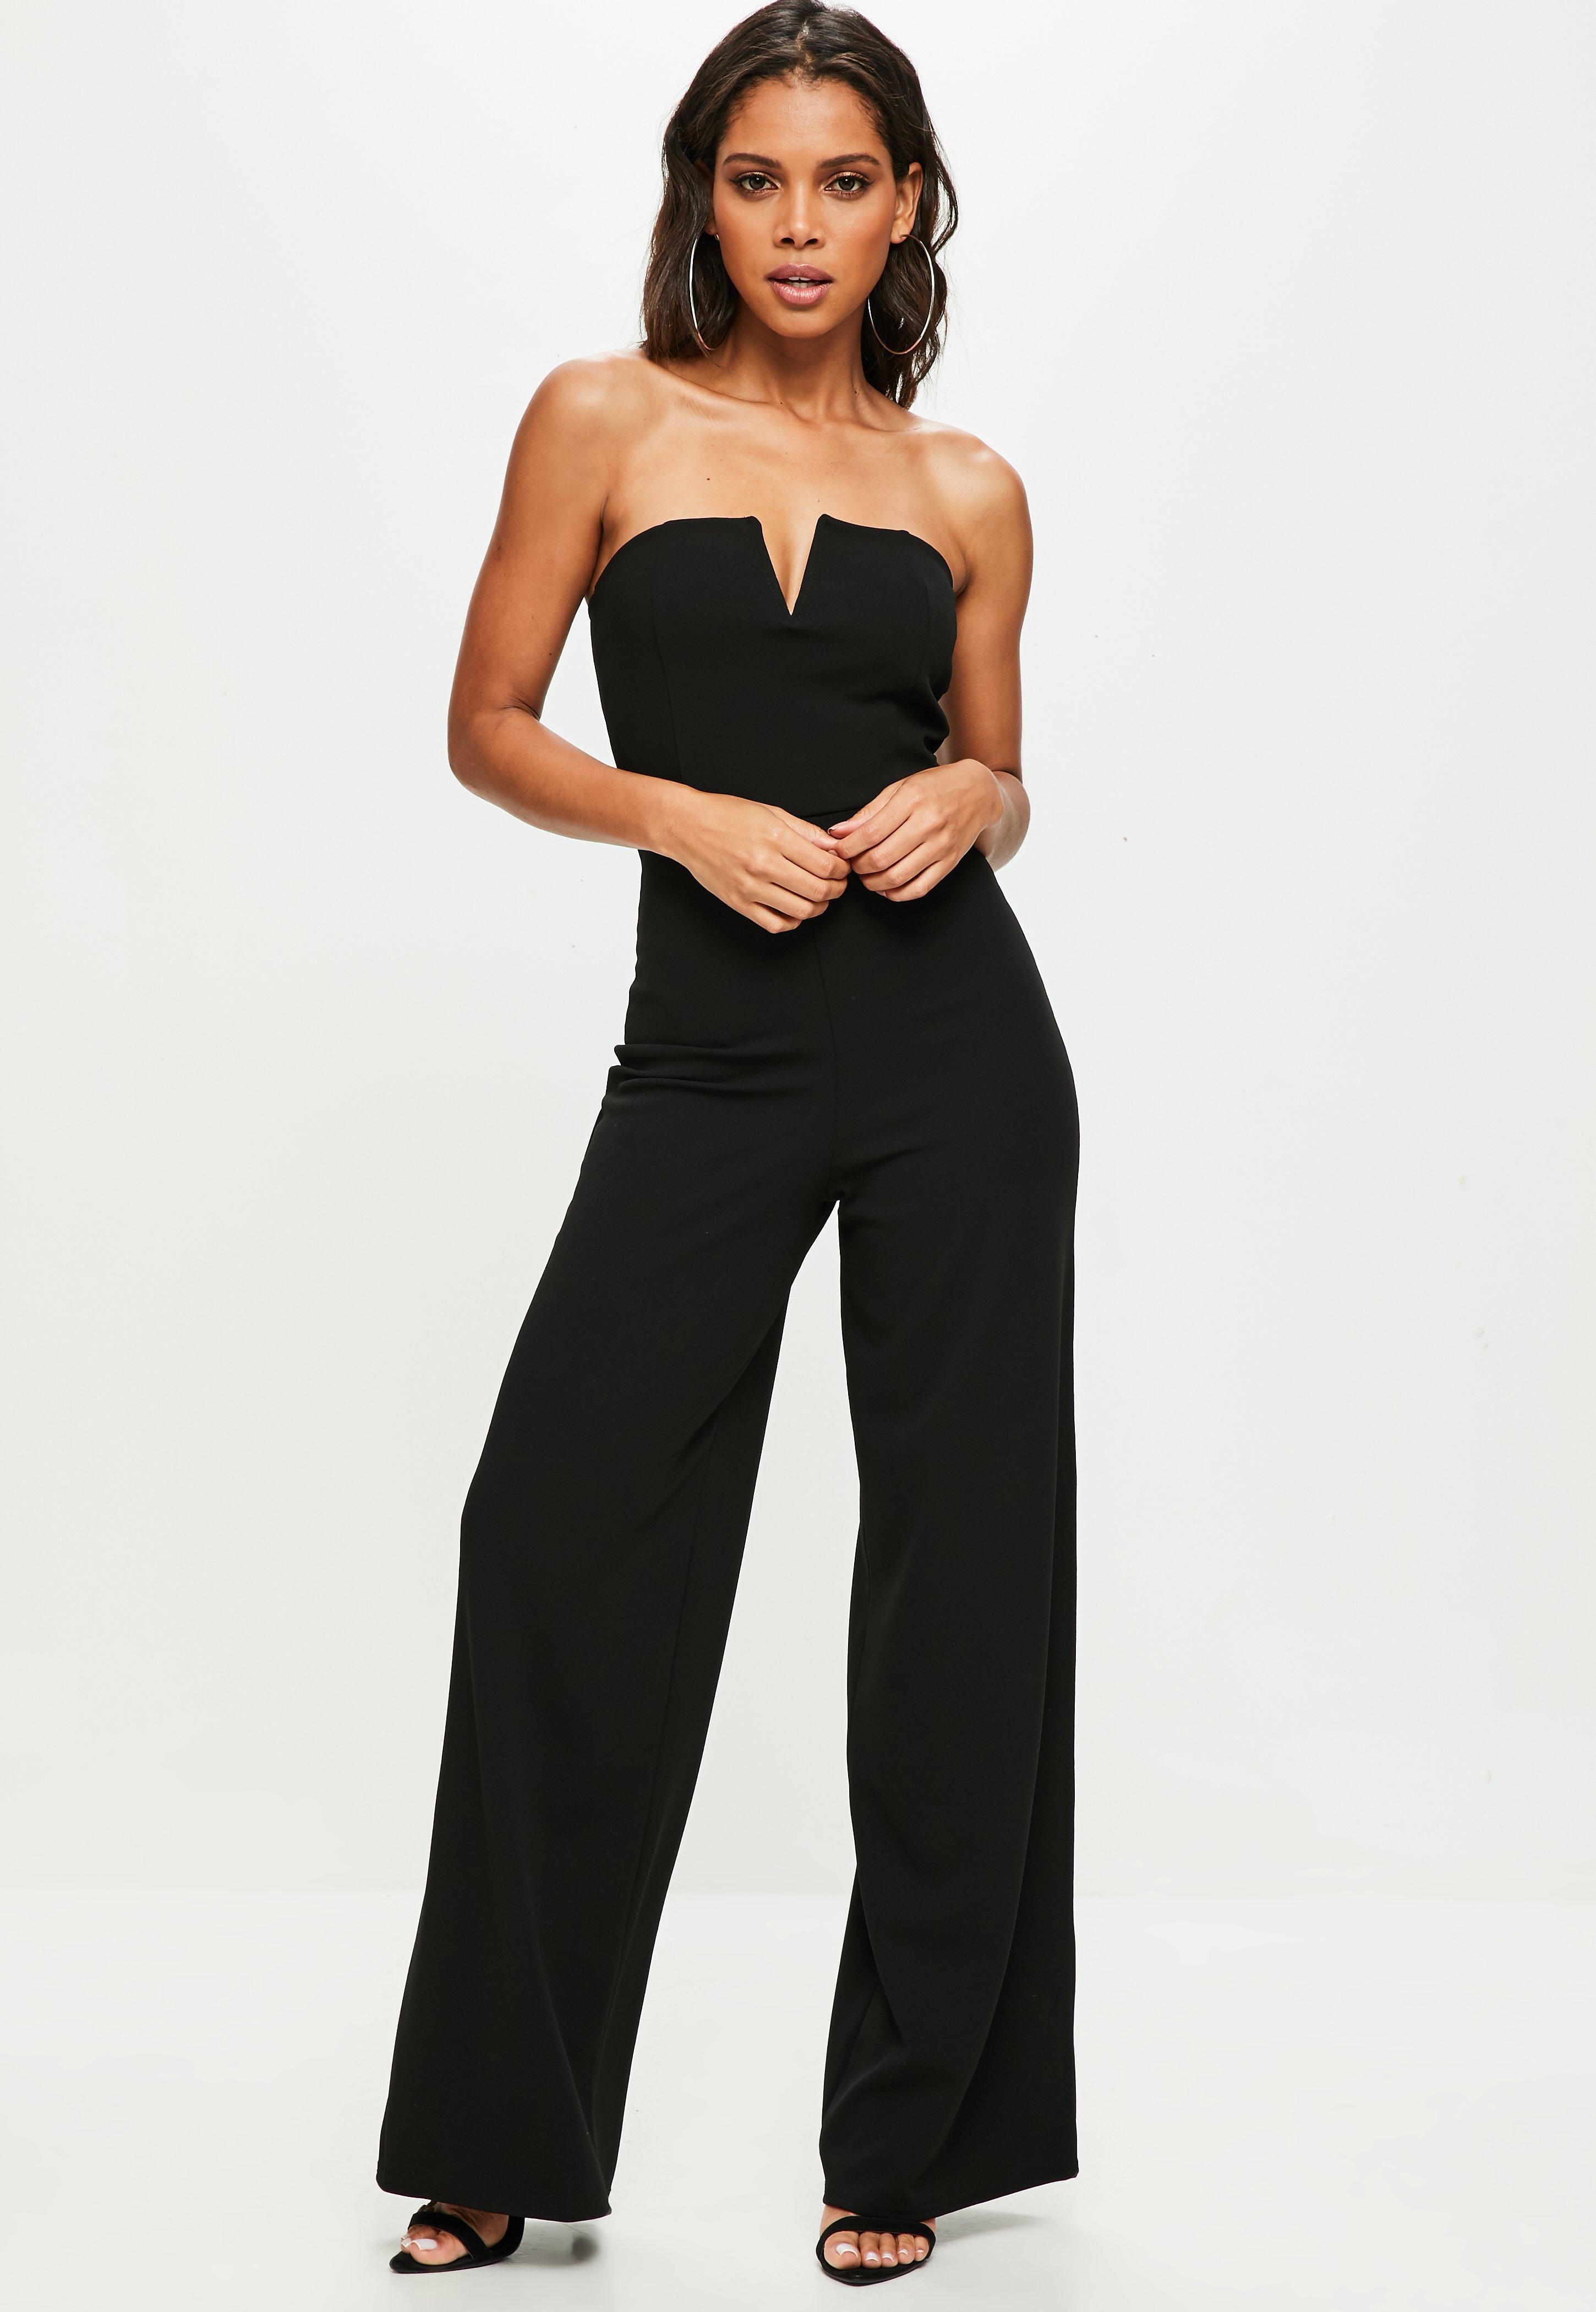 Shoping around (Star) Black-bandeau-wide-leg-jumpsuit